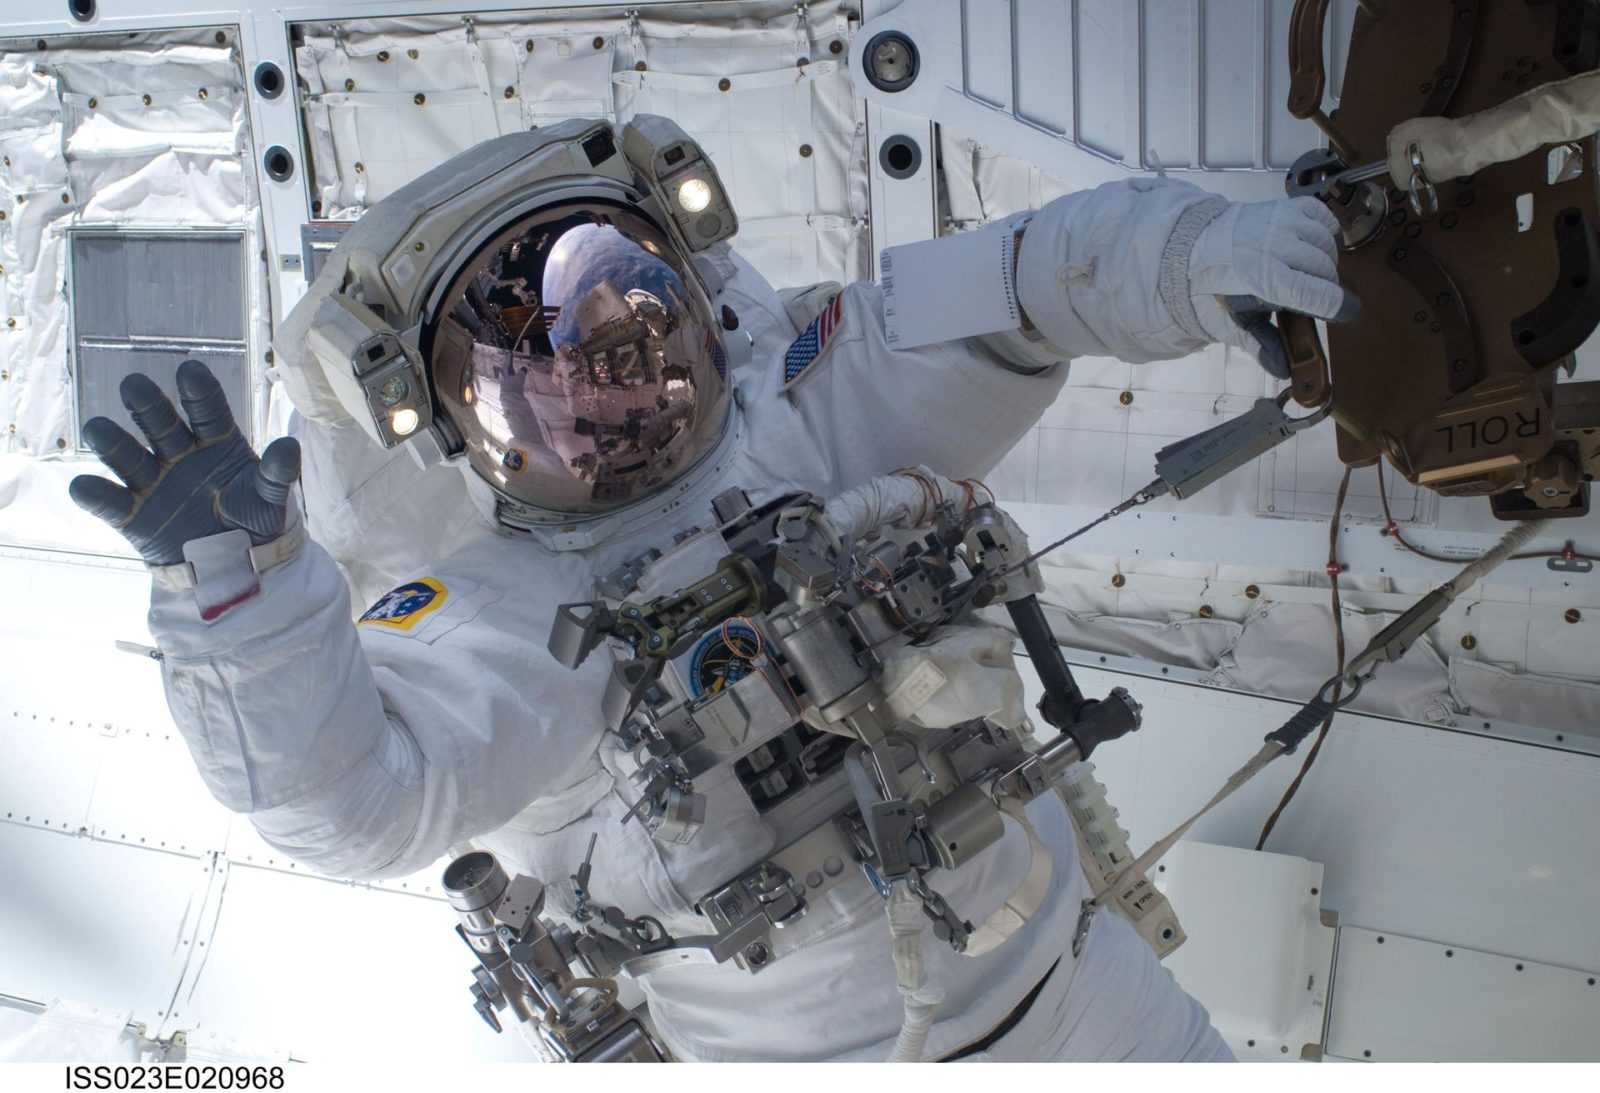 Anderson during EVA 1